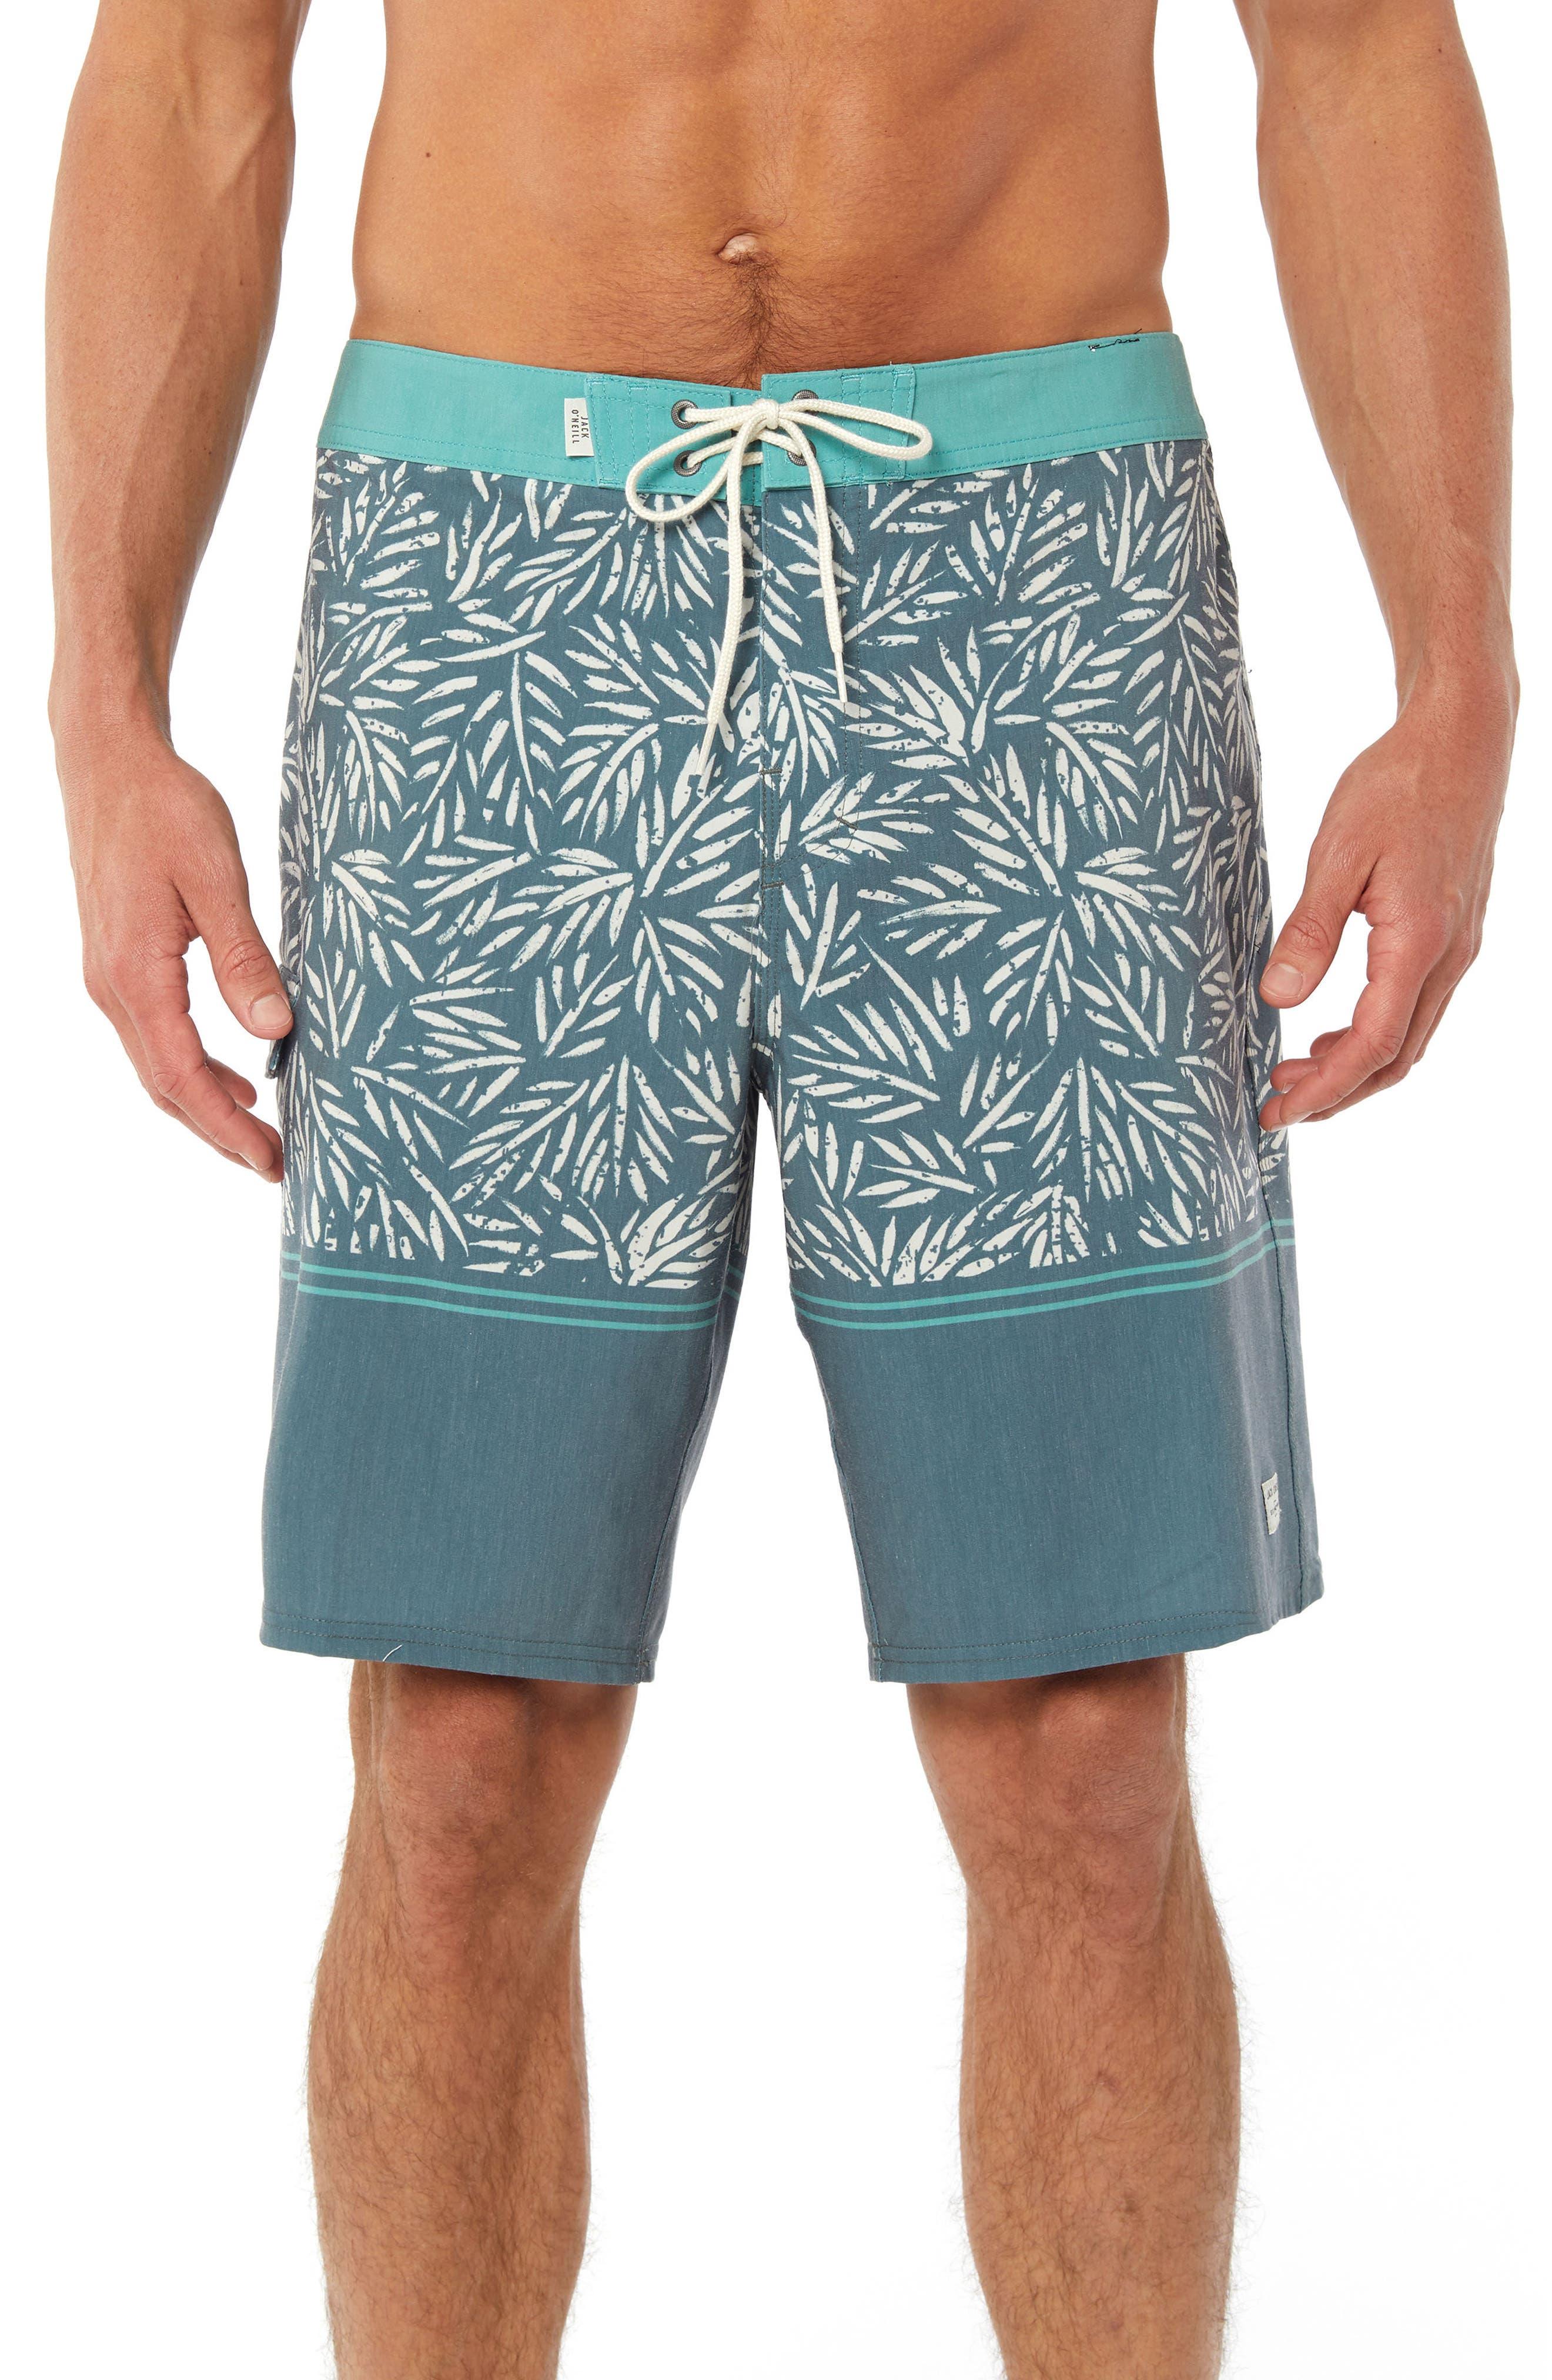 Vacay Board Shorts,                         Main,                         color, DARK SEA GLASS